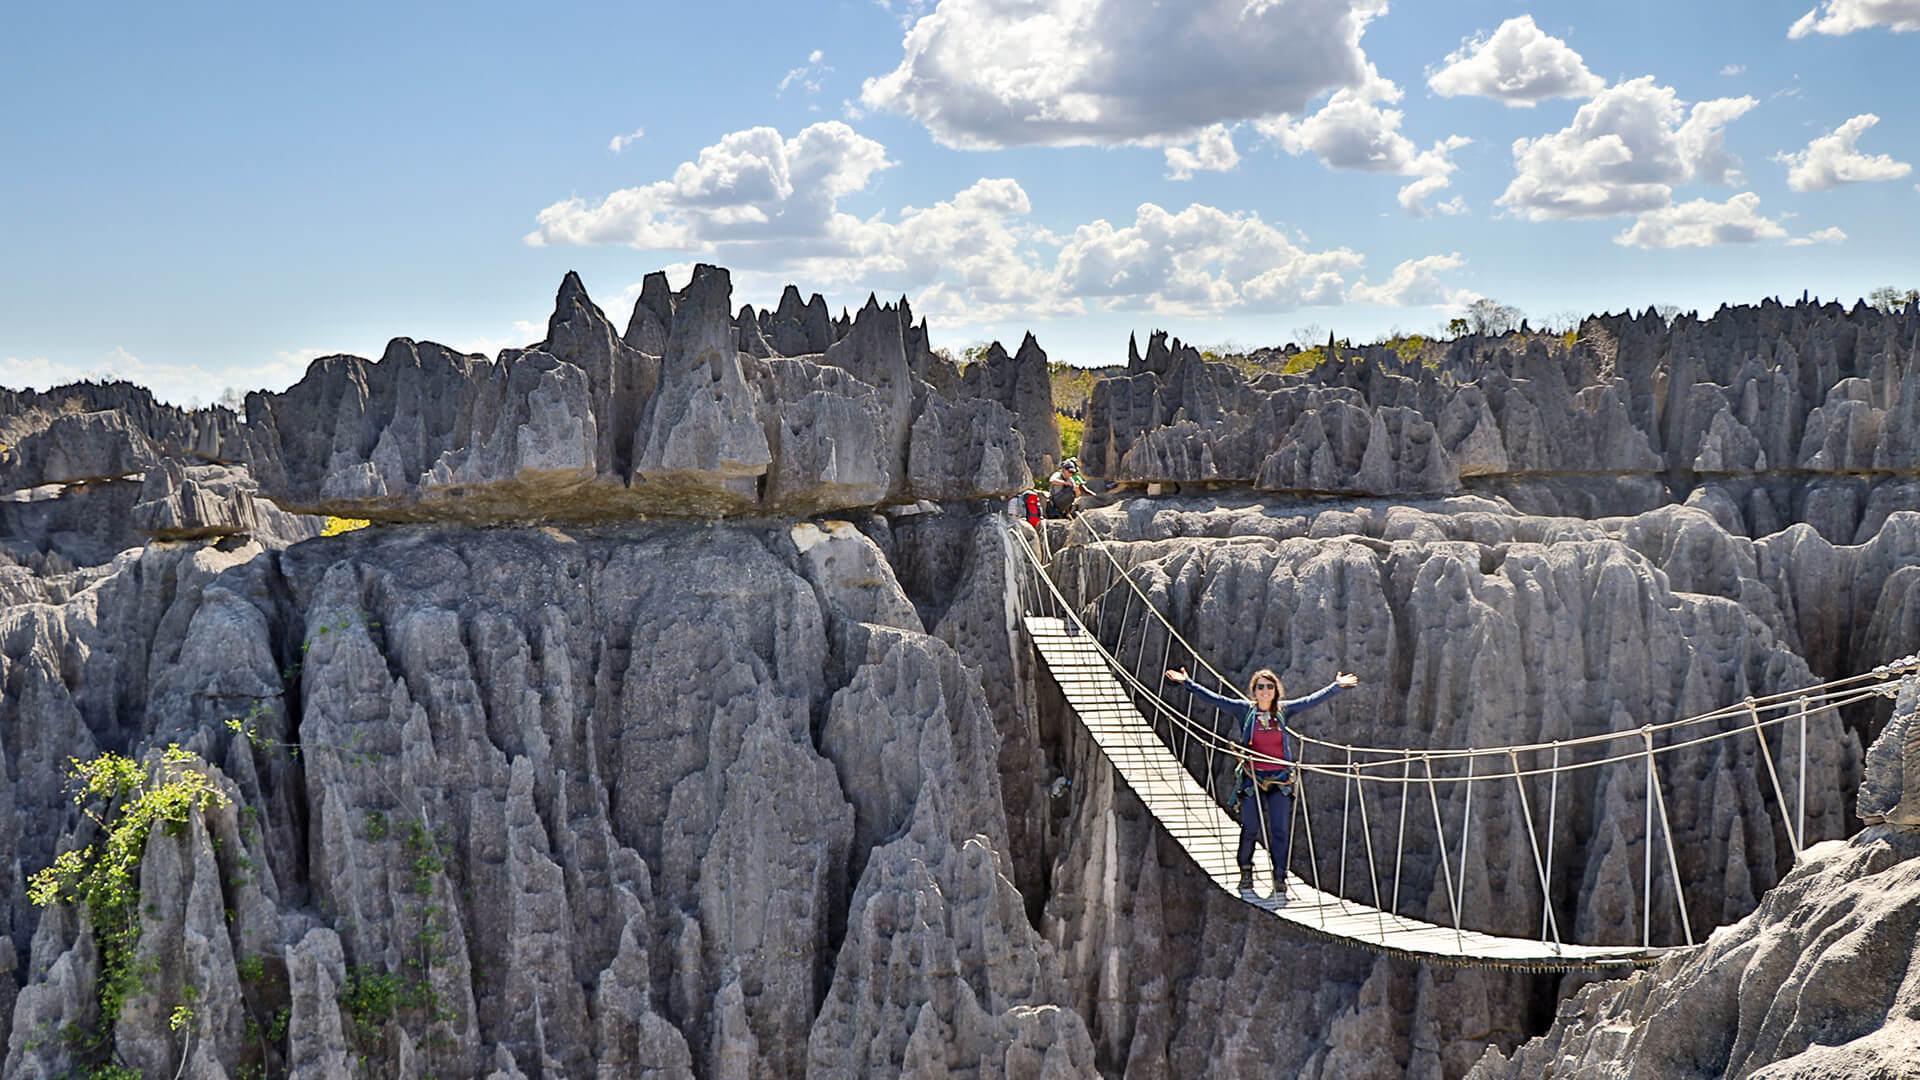 Tsingy de Bemaraha Hängebrücke